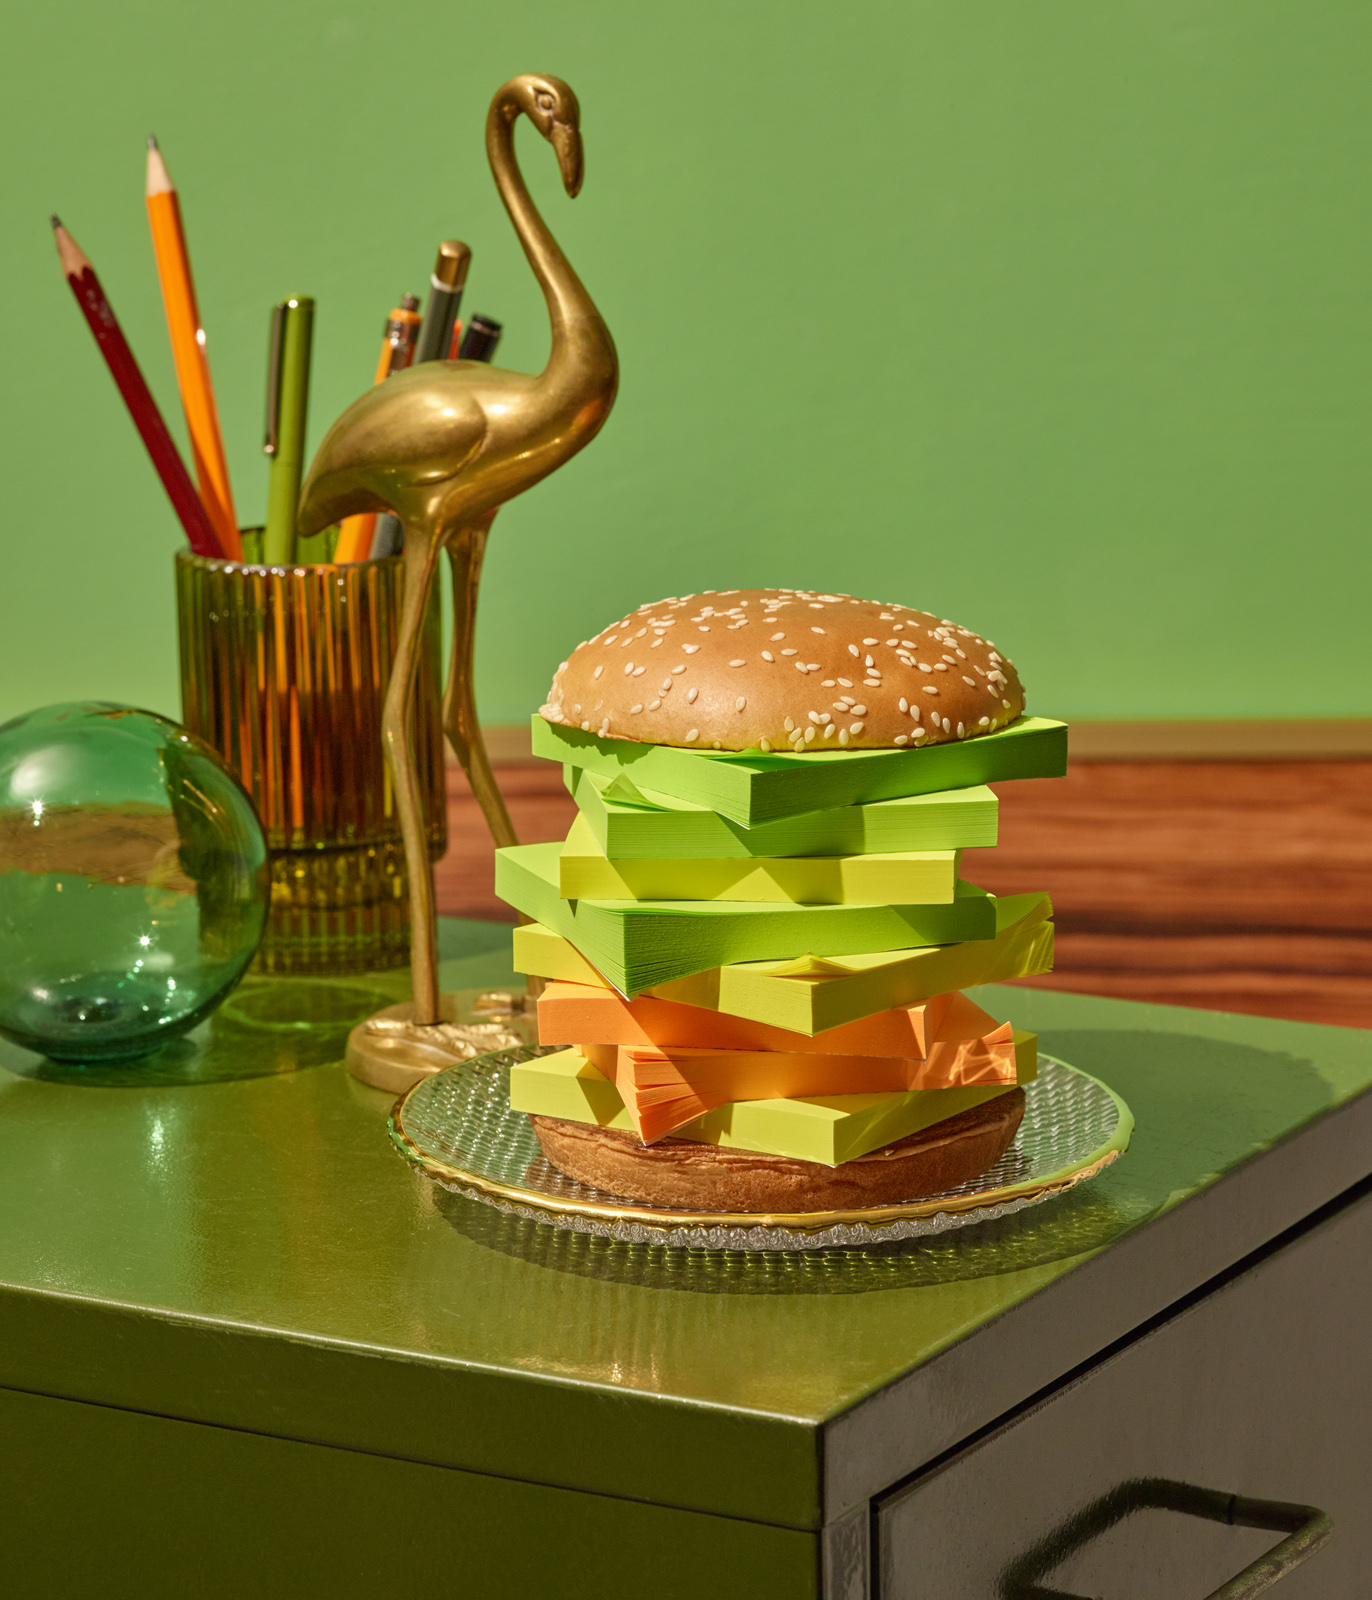 CaptureOne_Green_MM_84123_postit-burger